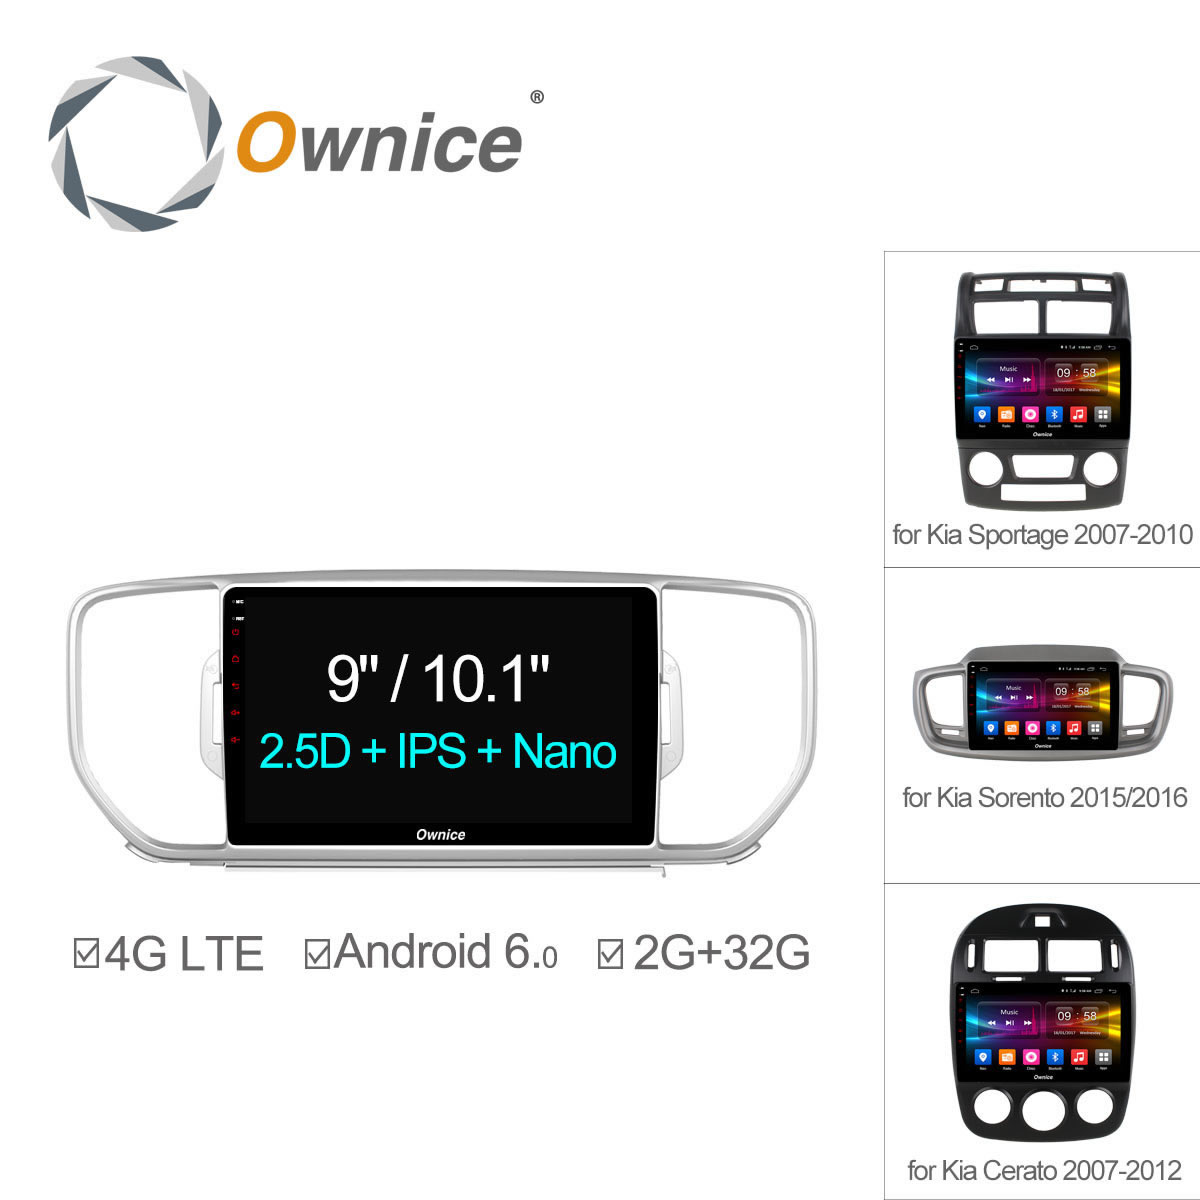 Ownice KX5 C500 + Android 6.0 8 Núcleo Para KIA Sportage Sorento Cerato K5 2006 2015 2016 Rádio Do Carro GPS Navi jogador 4G LTE 32 GB DVD